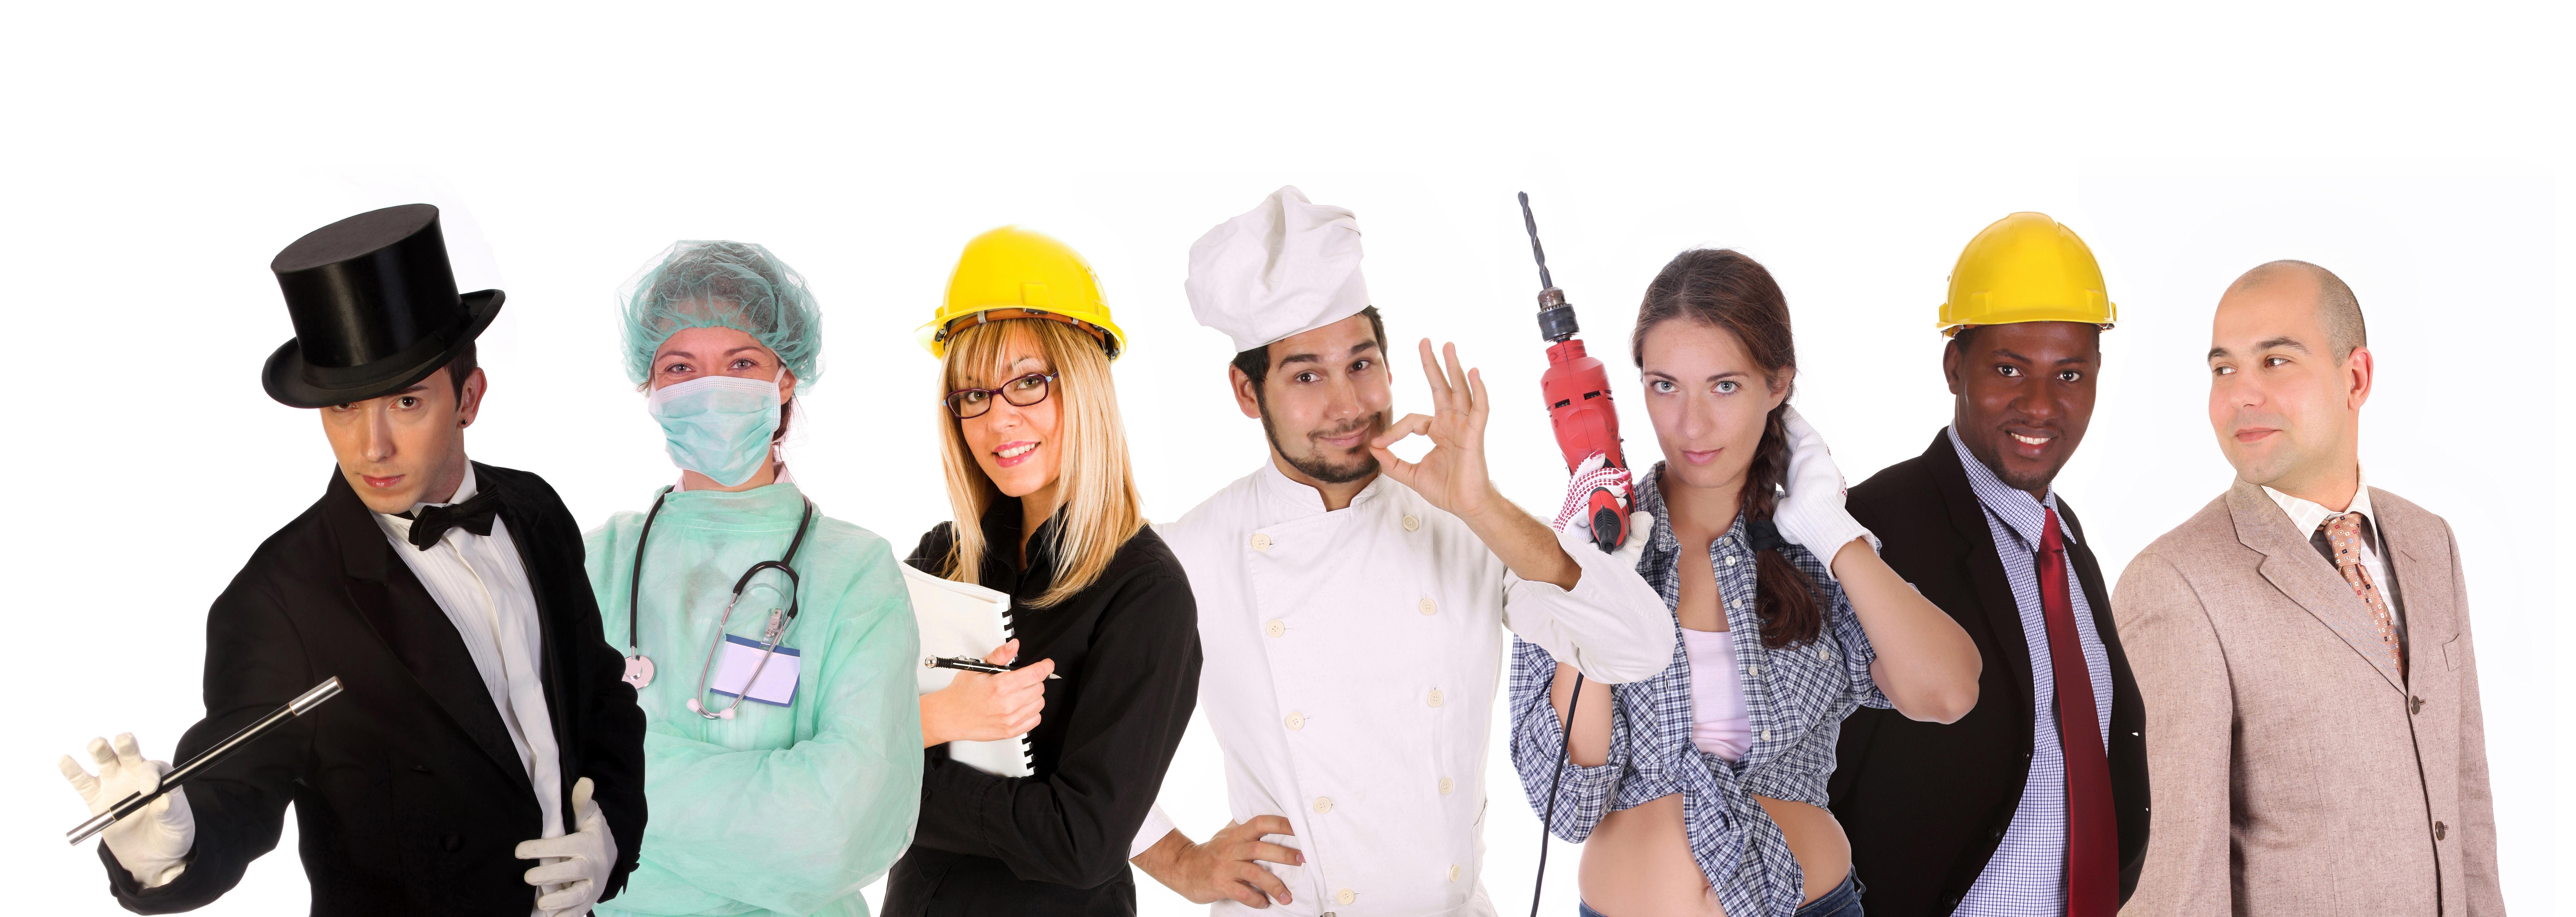 Choosing a career you love